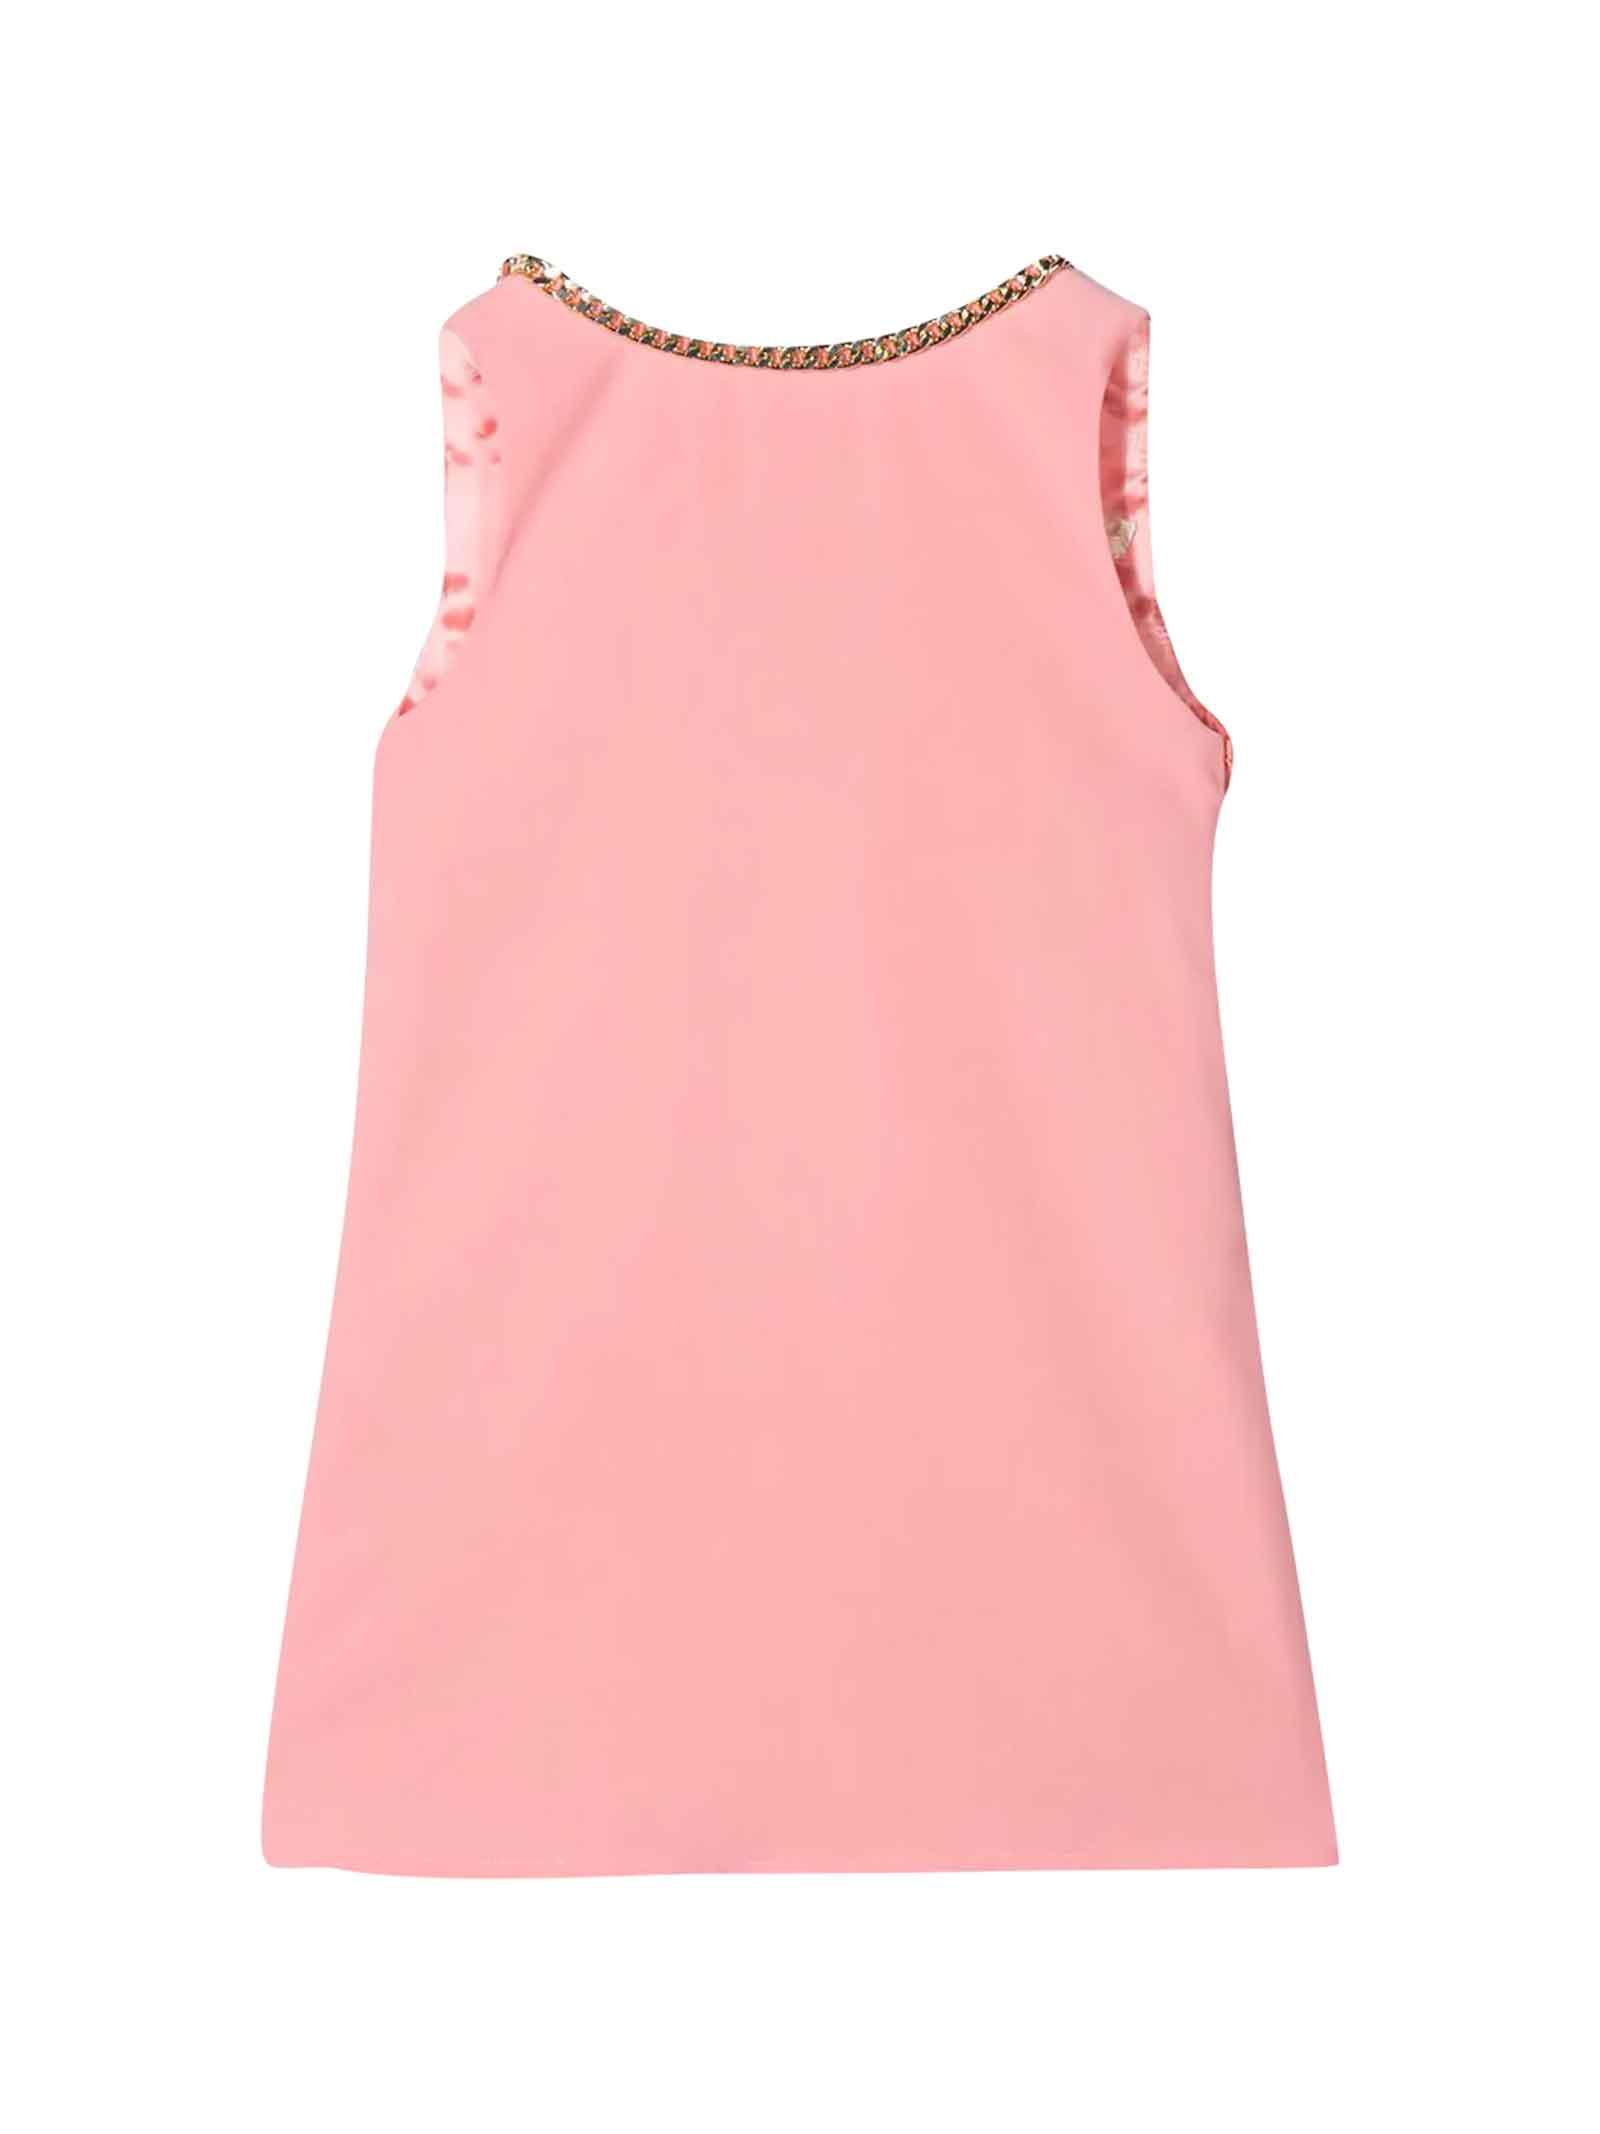 Buy Elisabetta Franchi La Mia Bambina Pink Flared Teen Dress online, shop Elisabetta Franchi La Mia Bambina with free shipping